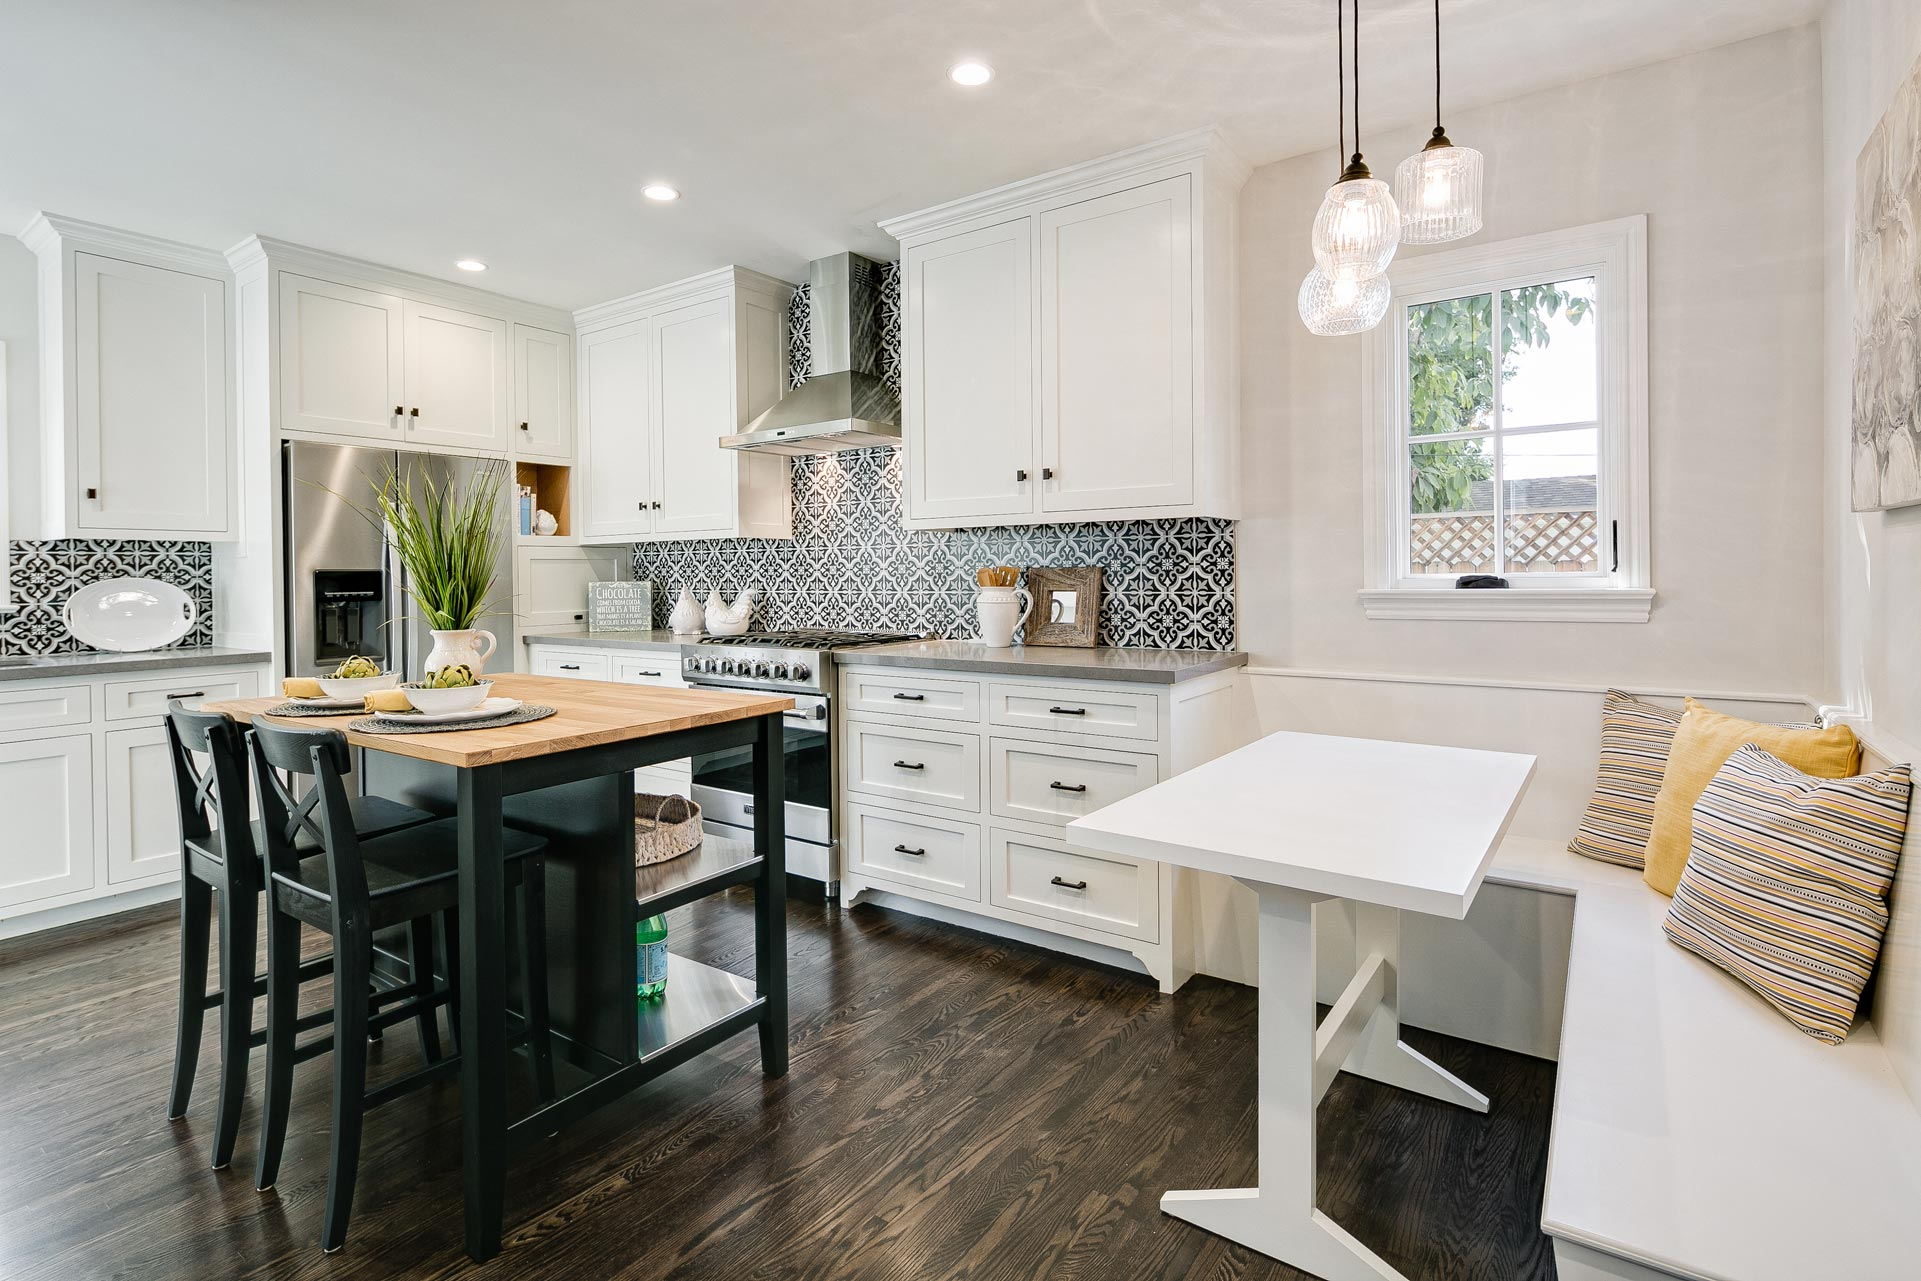 English-Cottage-Revival-Kitchen-Breakfast-Nook-Premier-General-Contractors.jpg